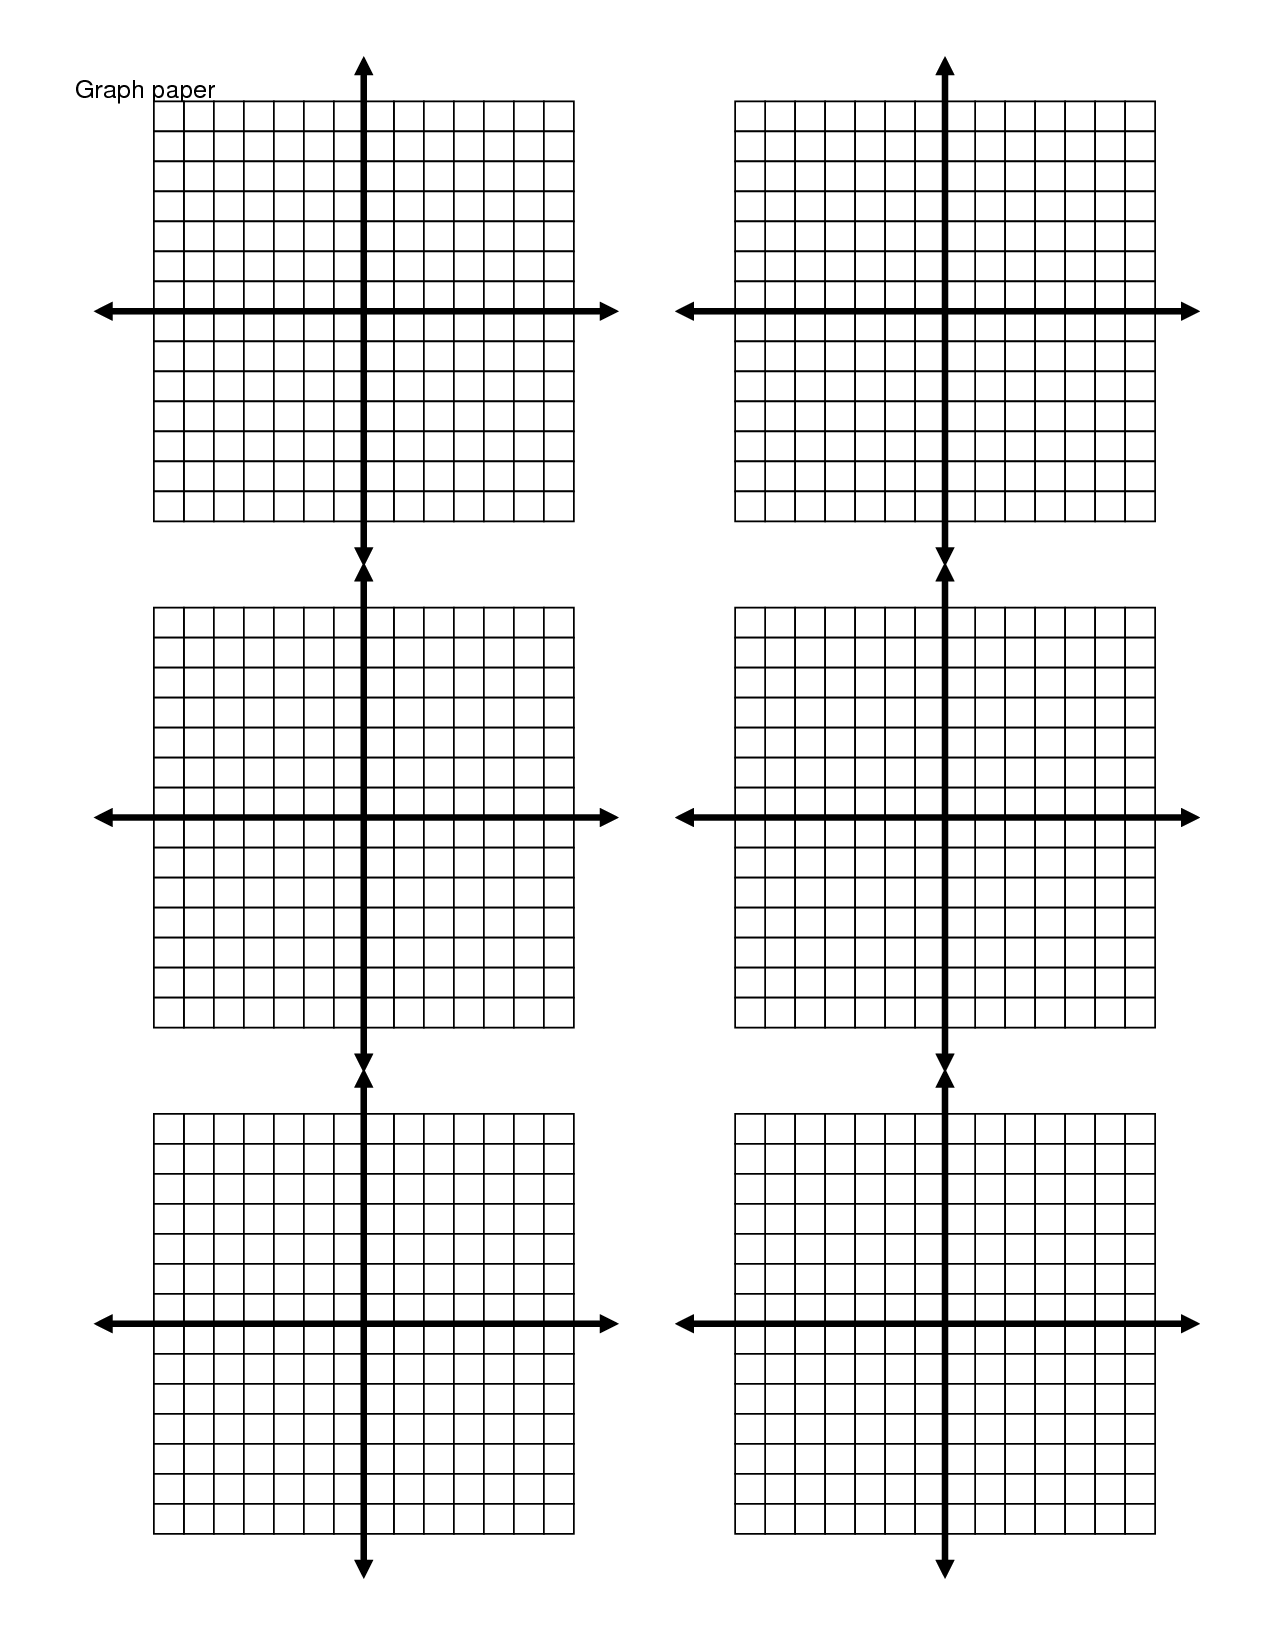 templates 6 per page bqTOtanu   Coordinate plane graphing [ 1650 x 1275 Pixel ]